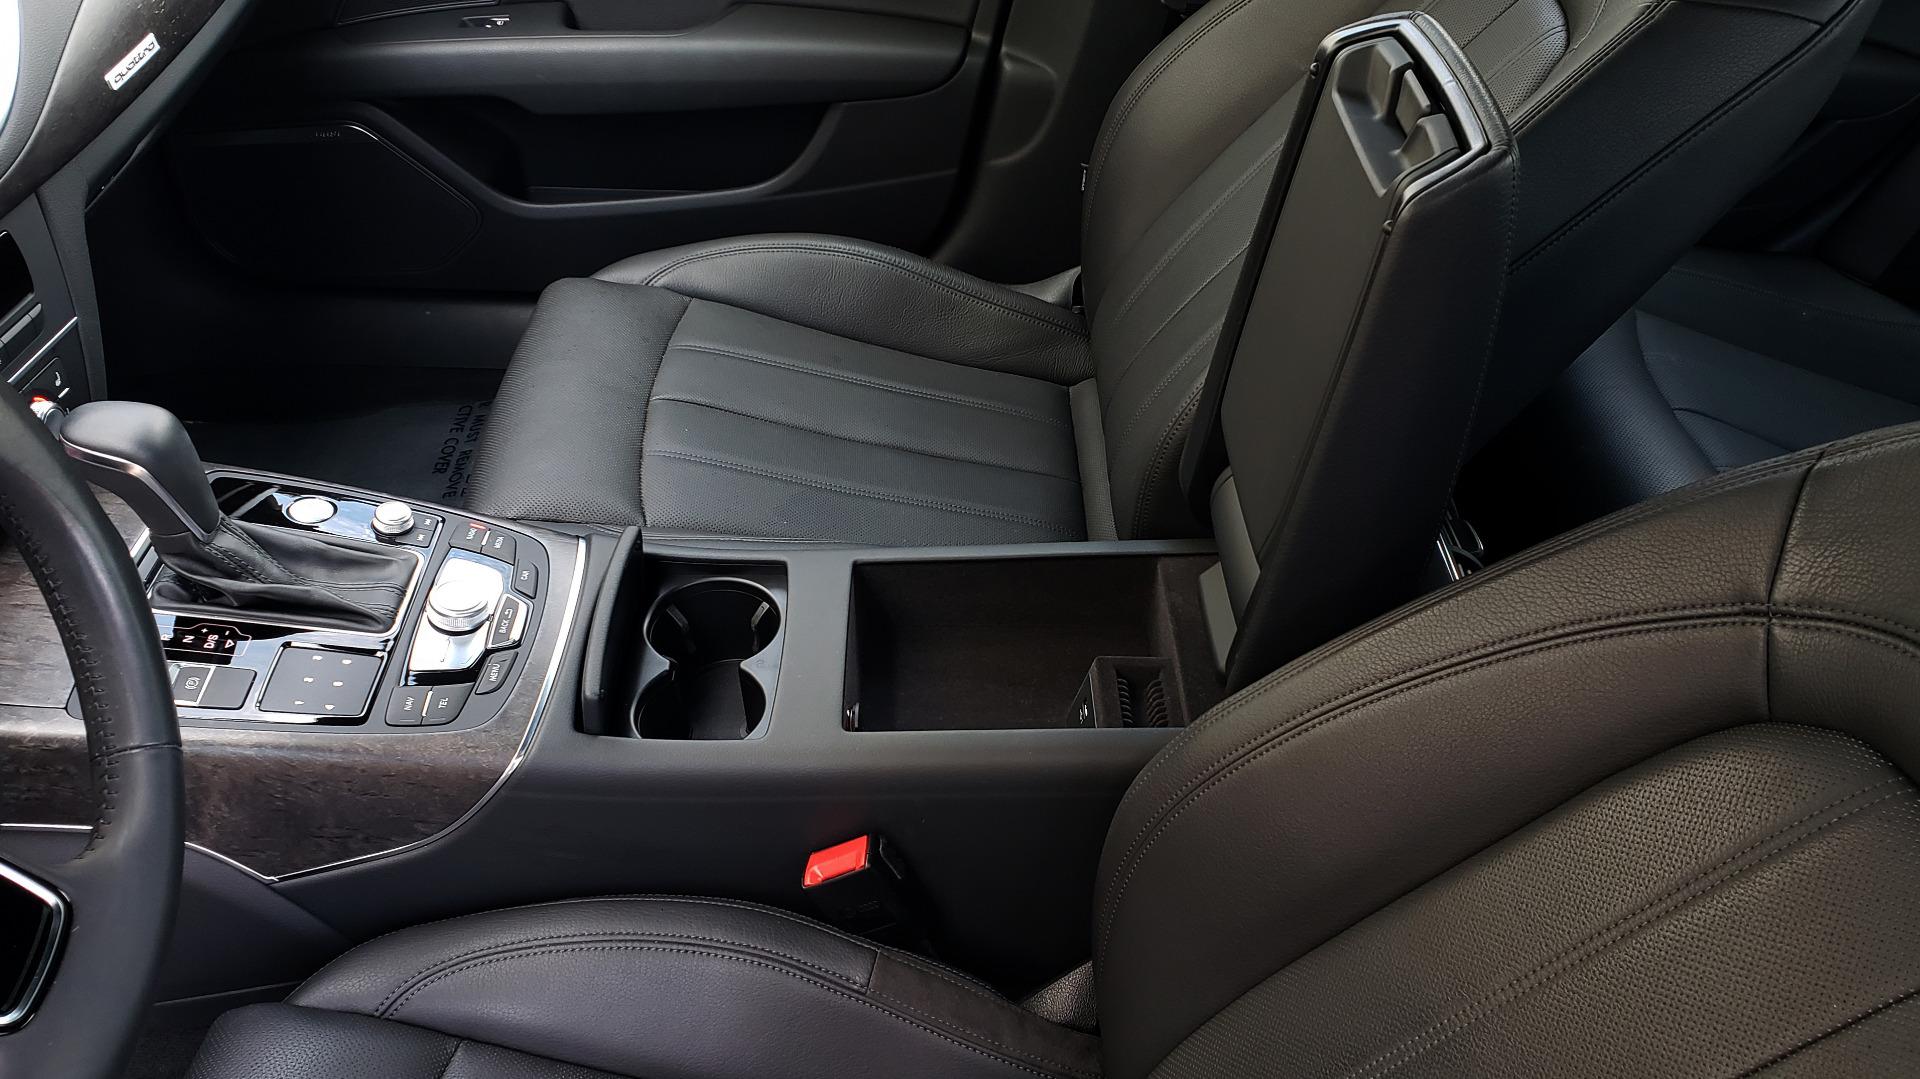 Used 2017 Audi A7 PRESTIGE / DRVR ASST / S-LINE SPORT / NAV / REARVIEW for sale Sold at Formula Imports in Charlotte NC 28227 57